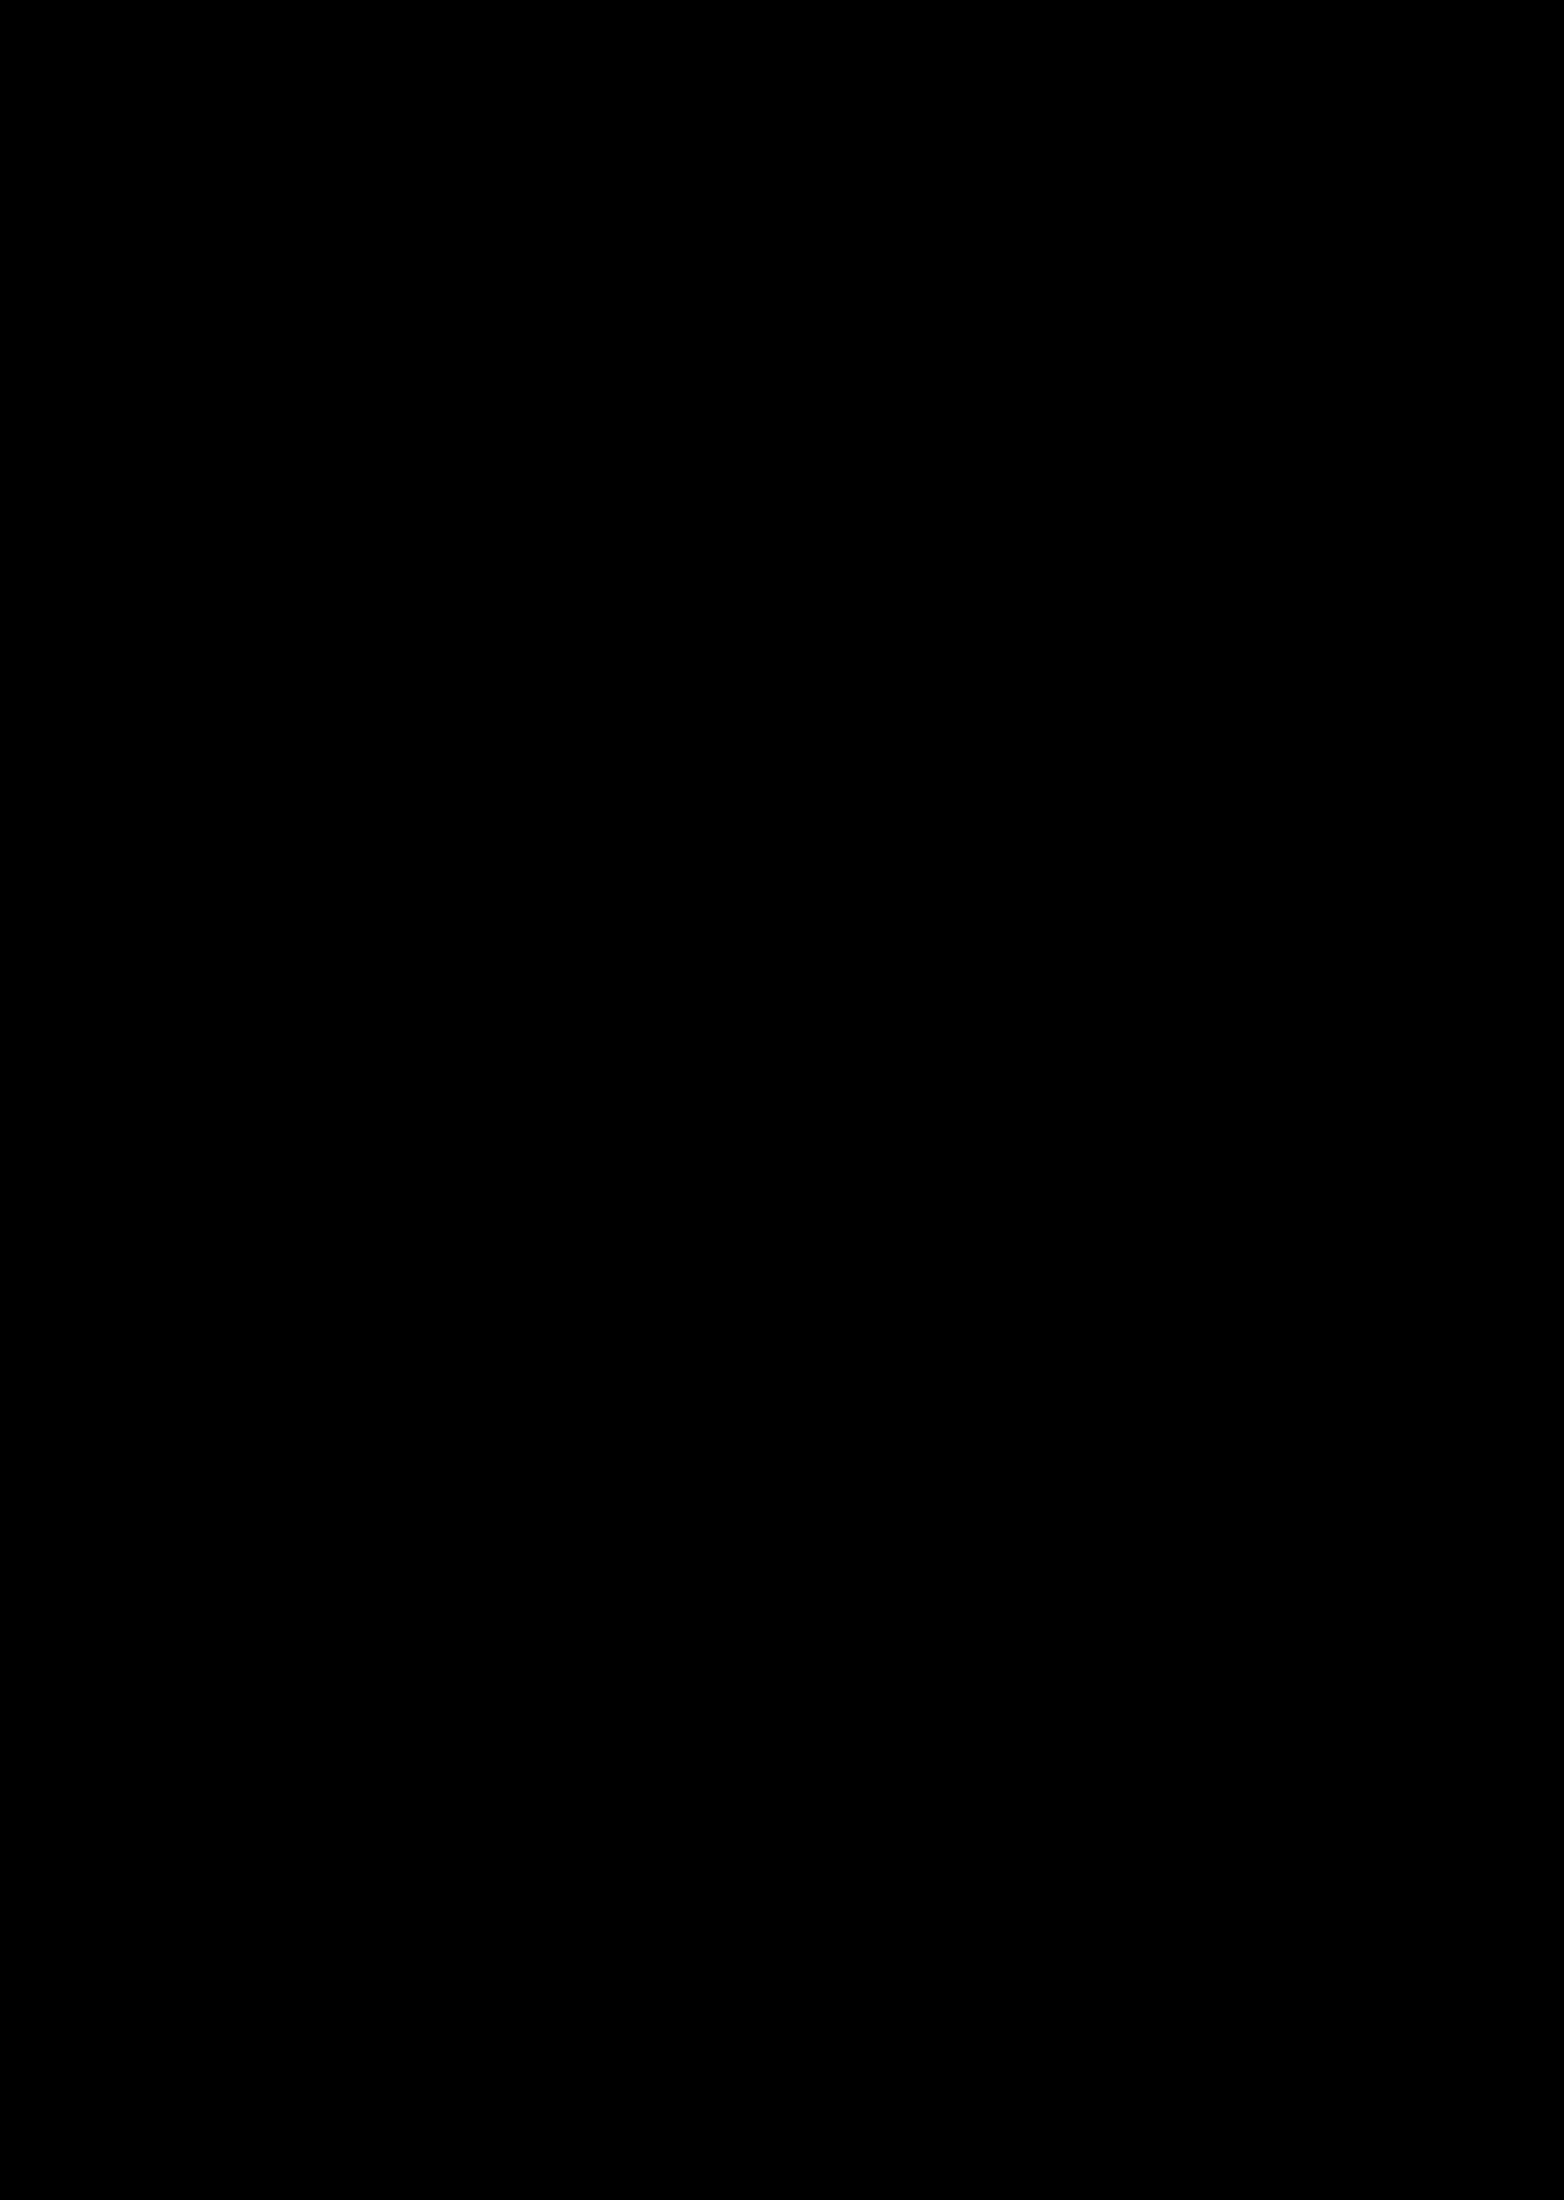 Clipart Windmill Silhouette